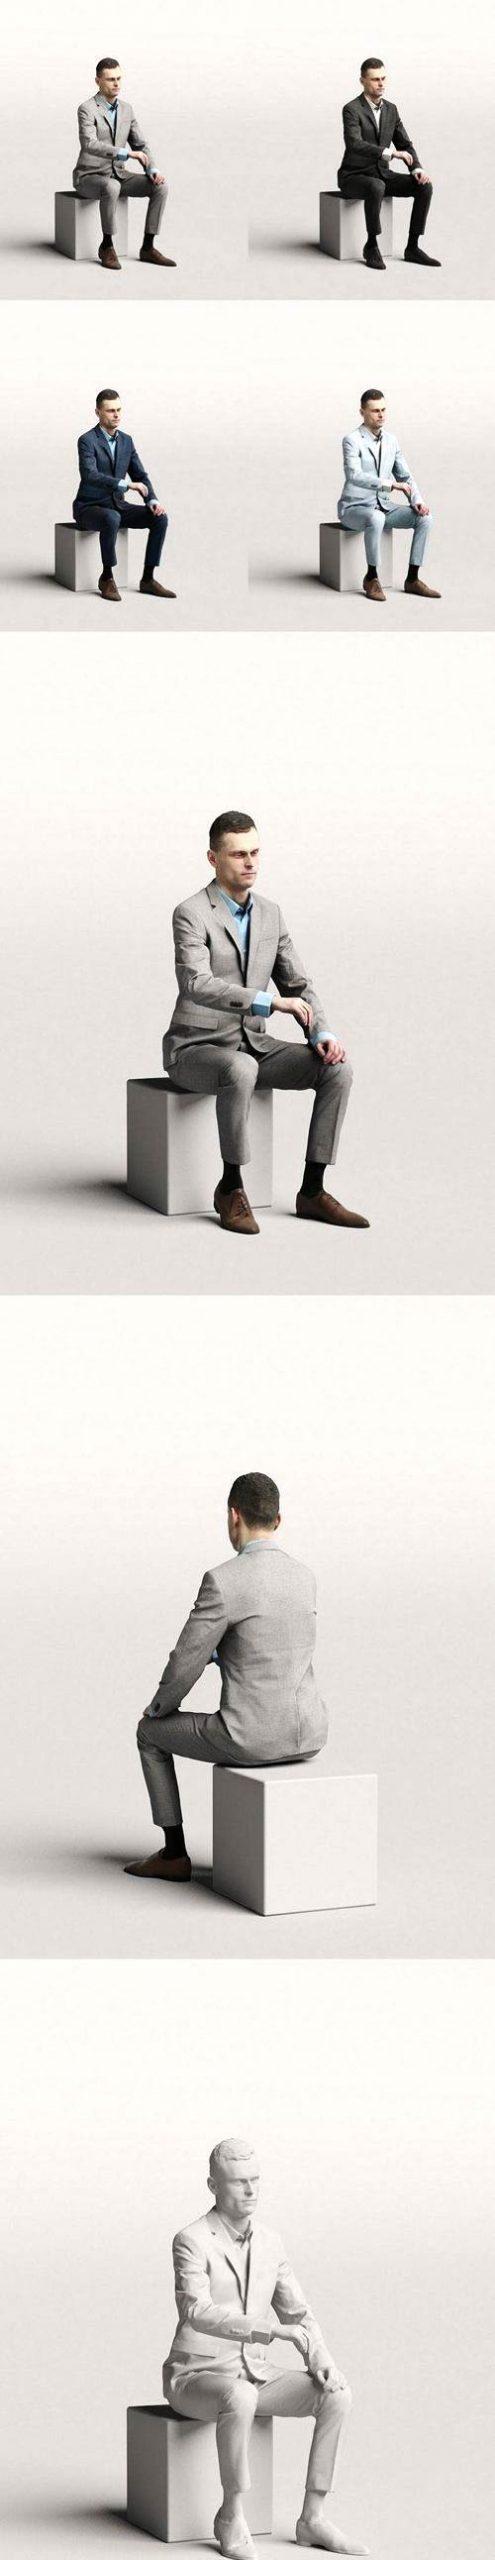 Elegant business man sitting and typing 0117 free download